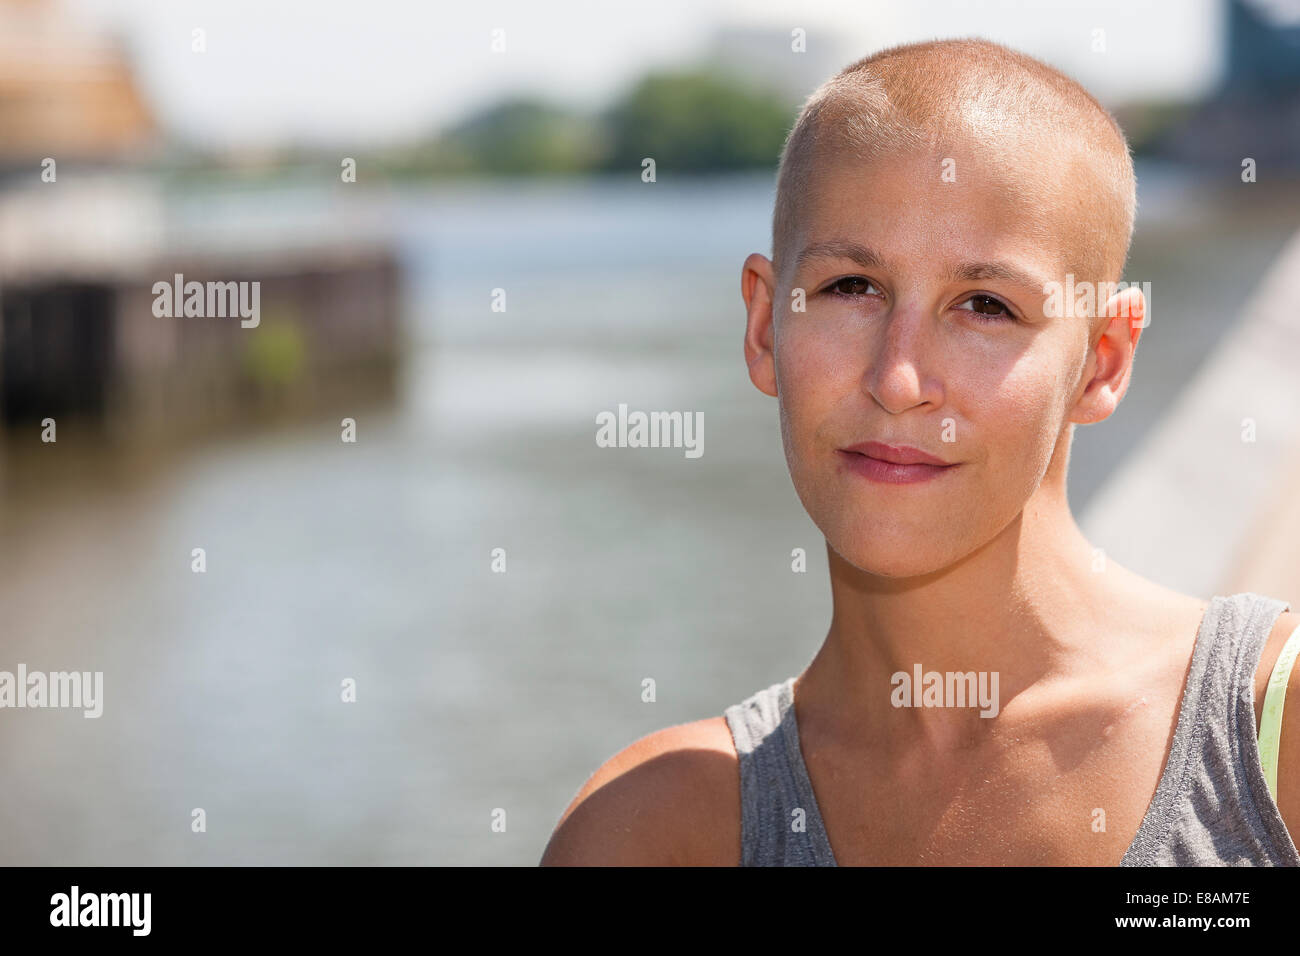 Retrato de calma joven sobreviviente de cáncer femenino Imagen De Stock